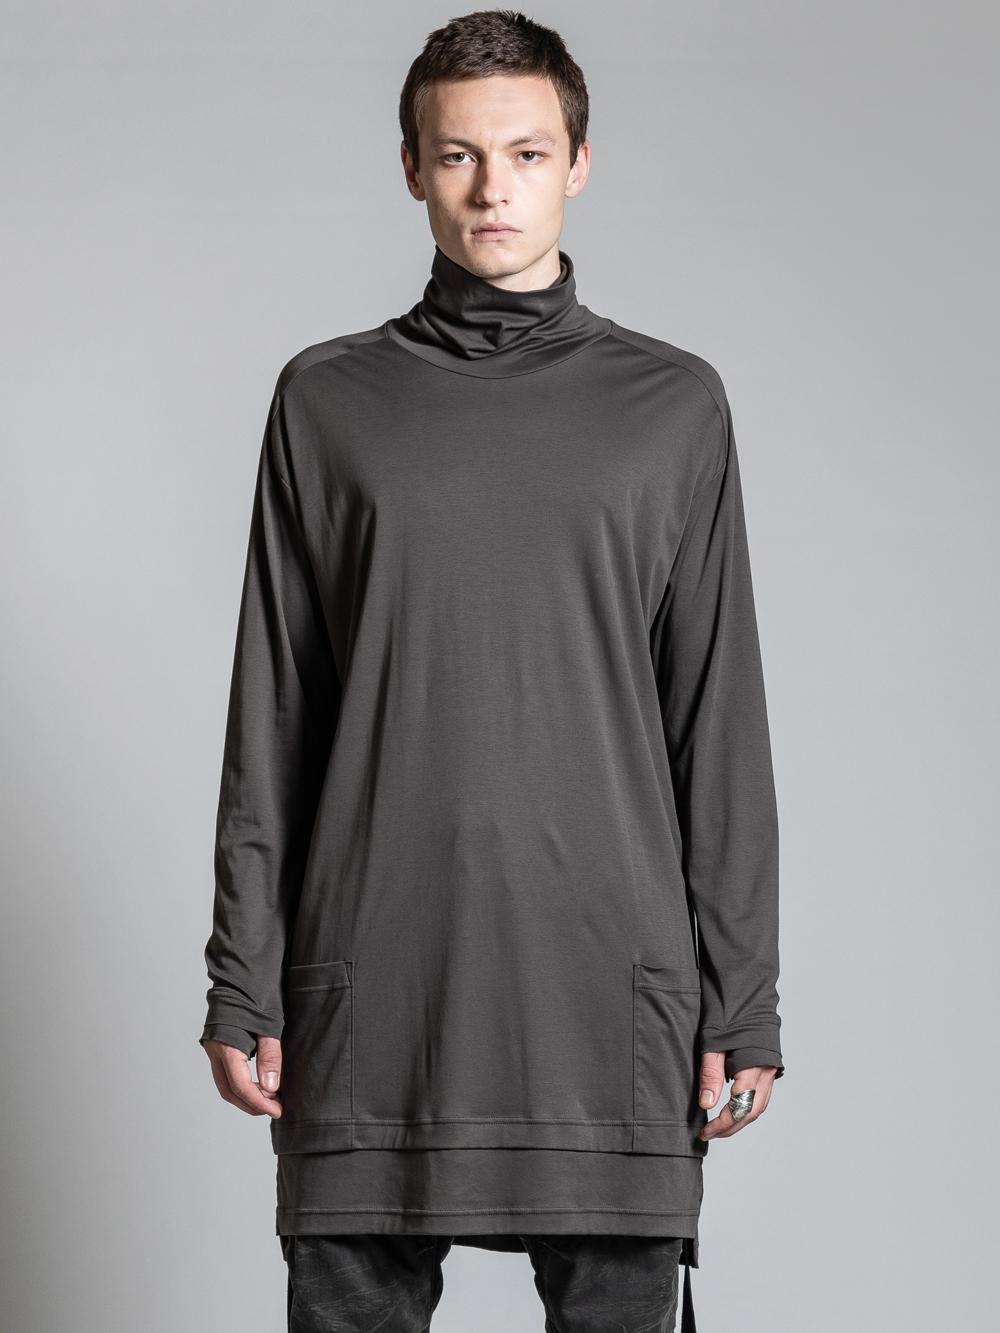 VI-2979-01 / 綿スムース ロング丈 タートルネックTシャツ